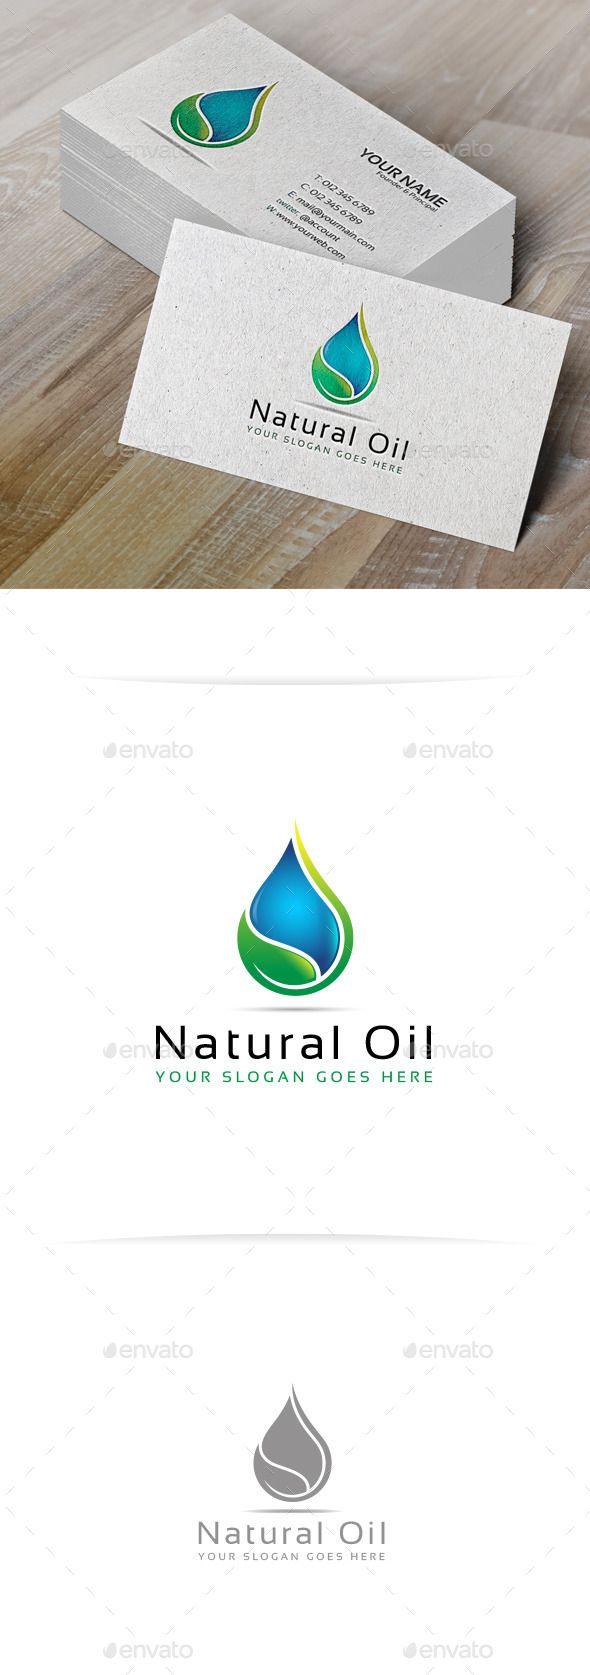 25 beautiful oil company logos ideas on pinterest oil